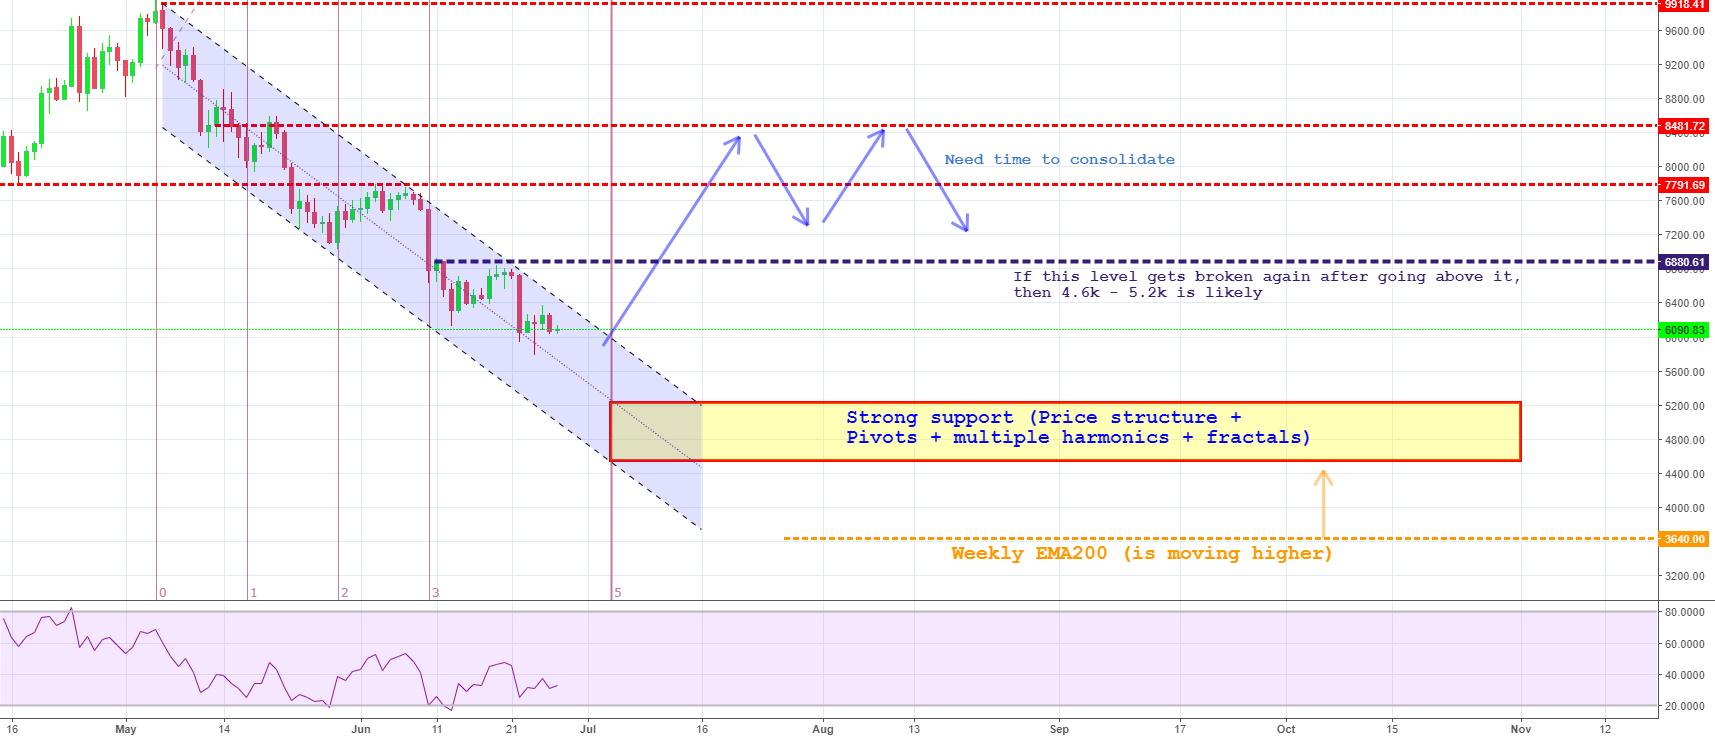 Will BTC reach <5k target?